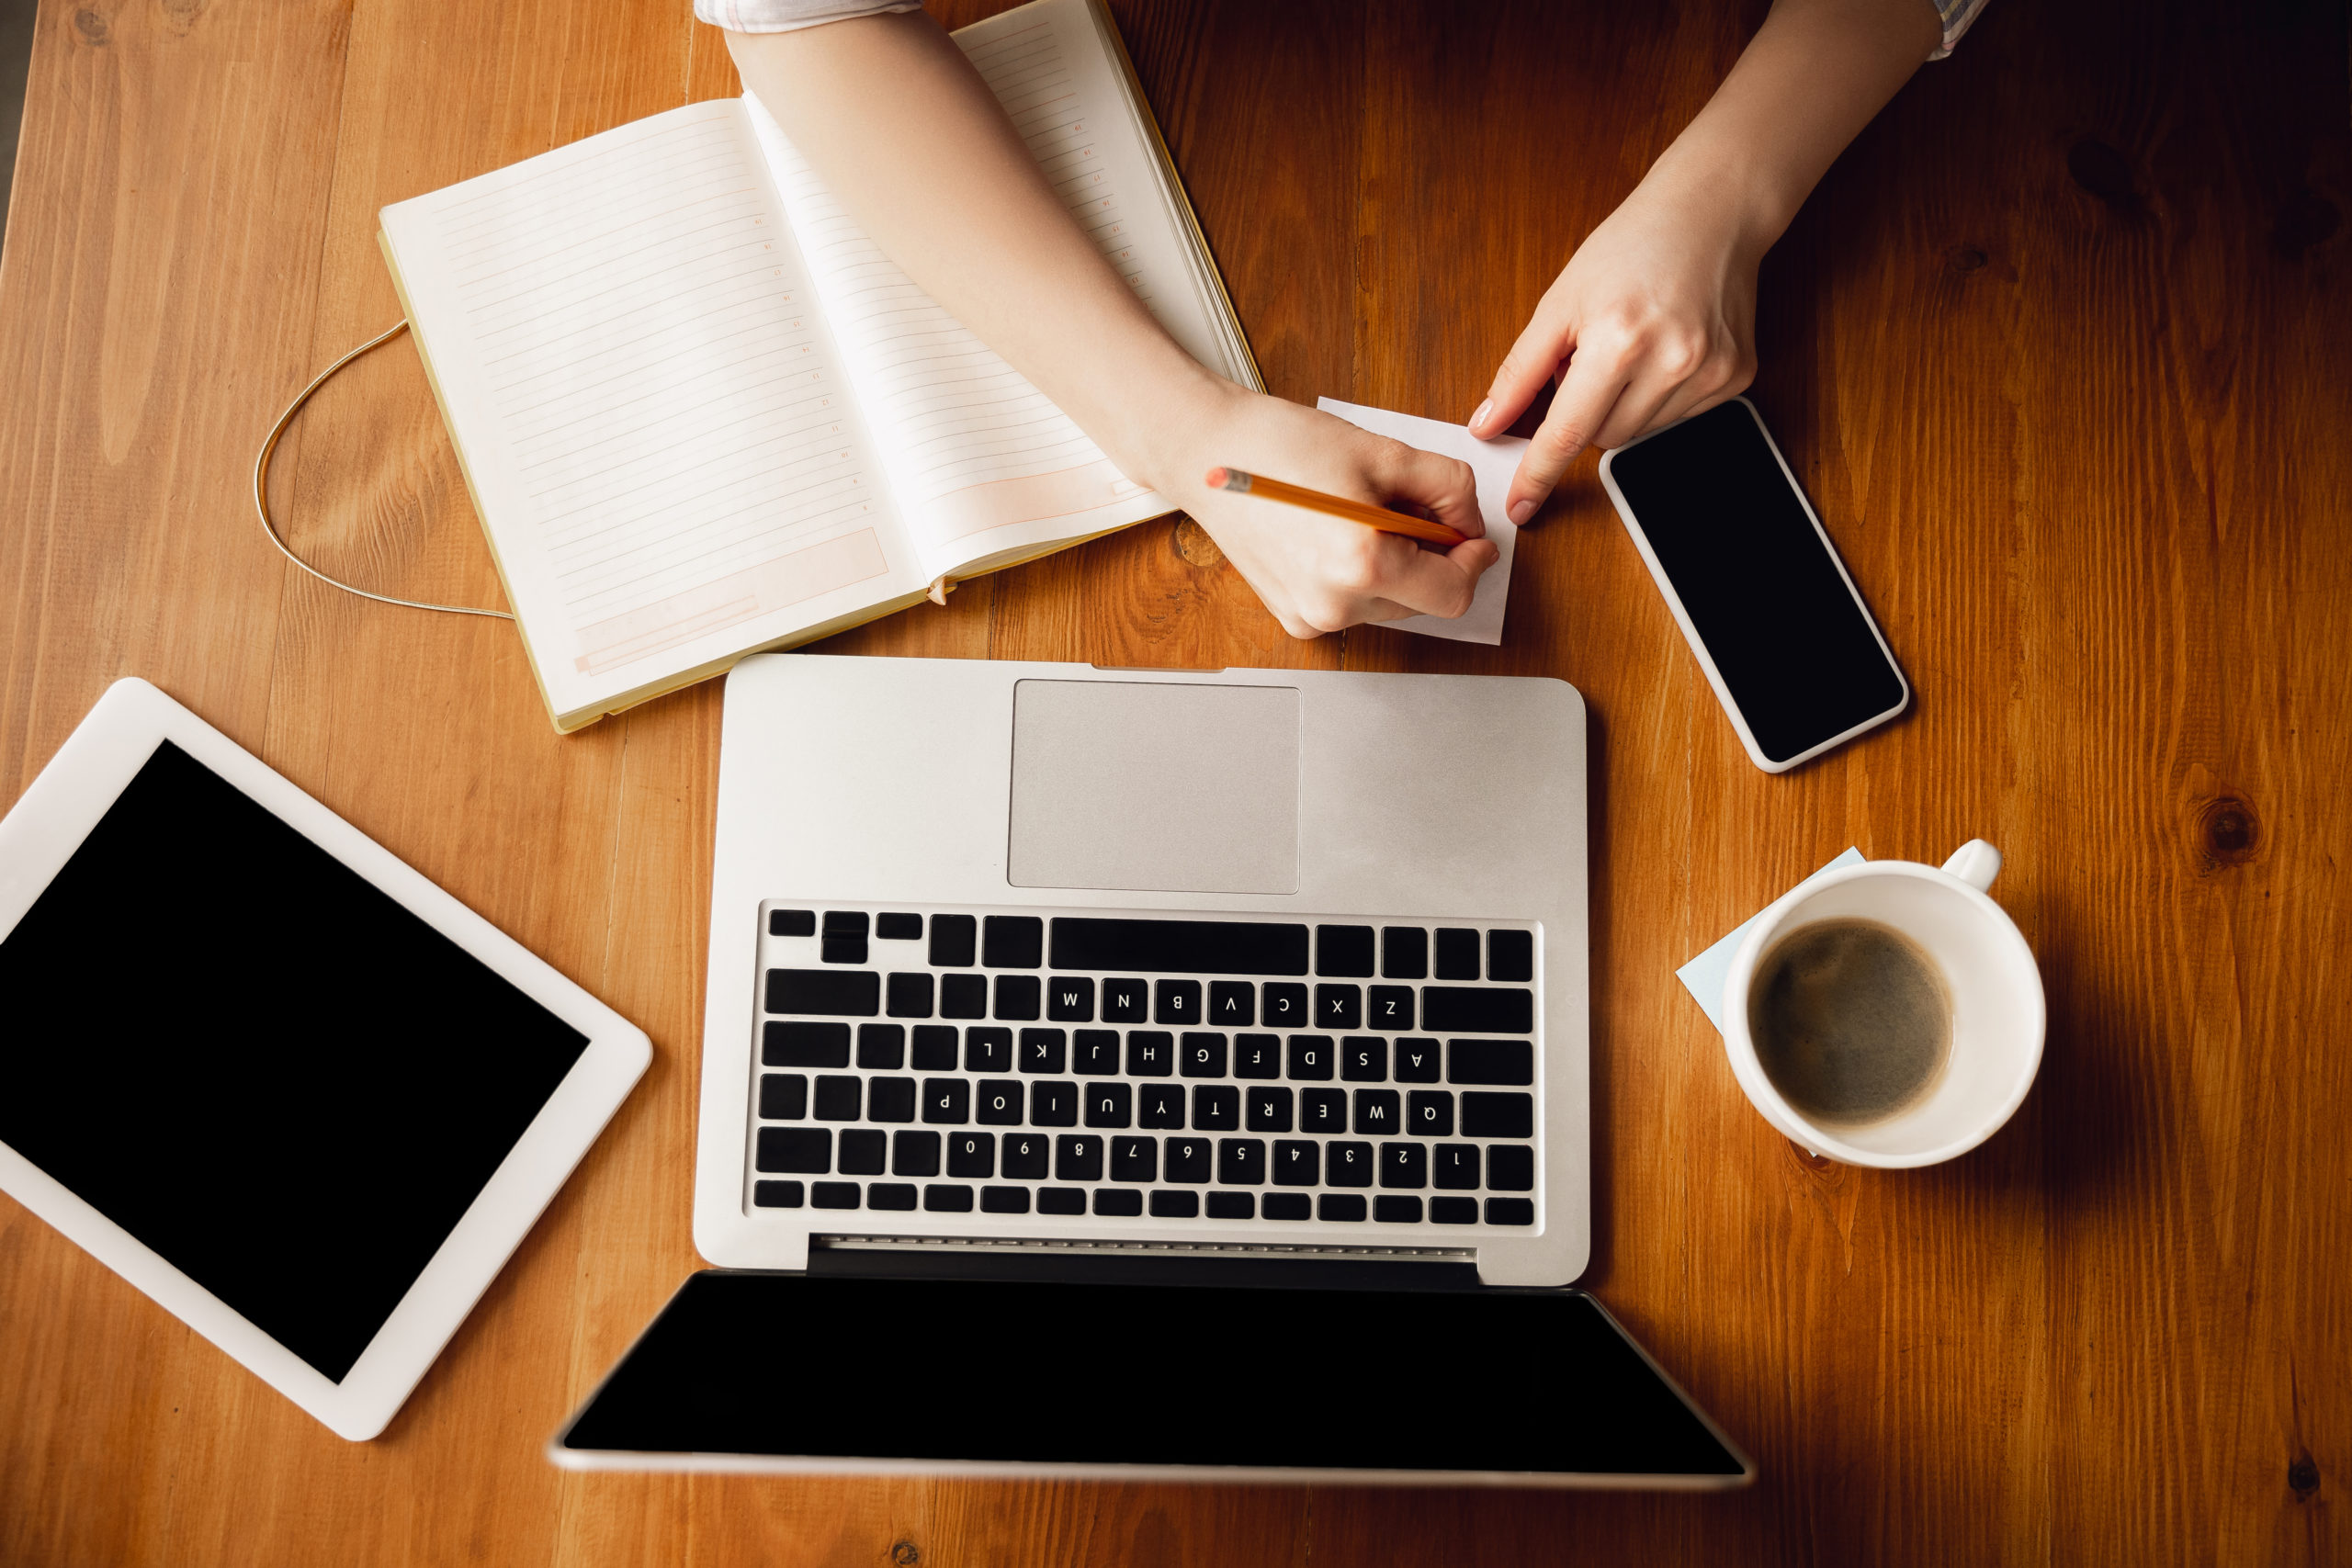 7 plataformas para vender cursos online | Facilite Tecnologia Contábil